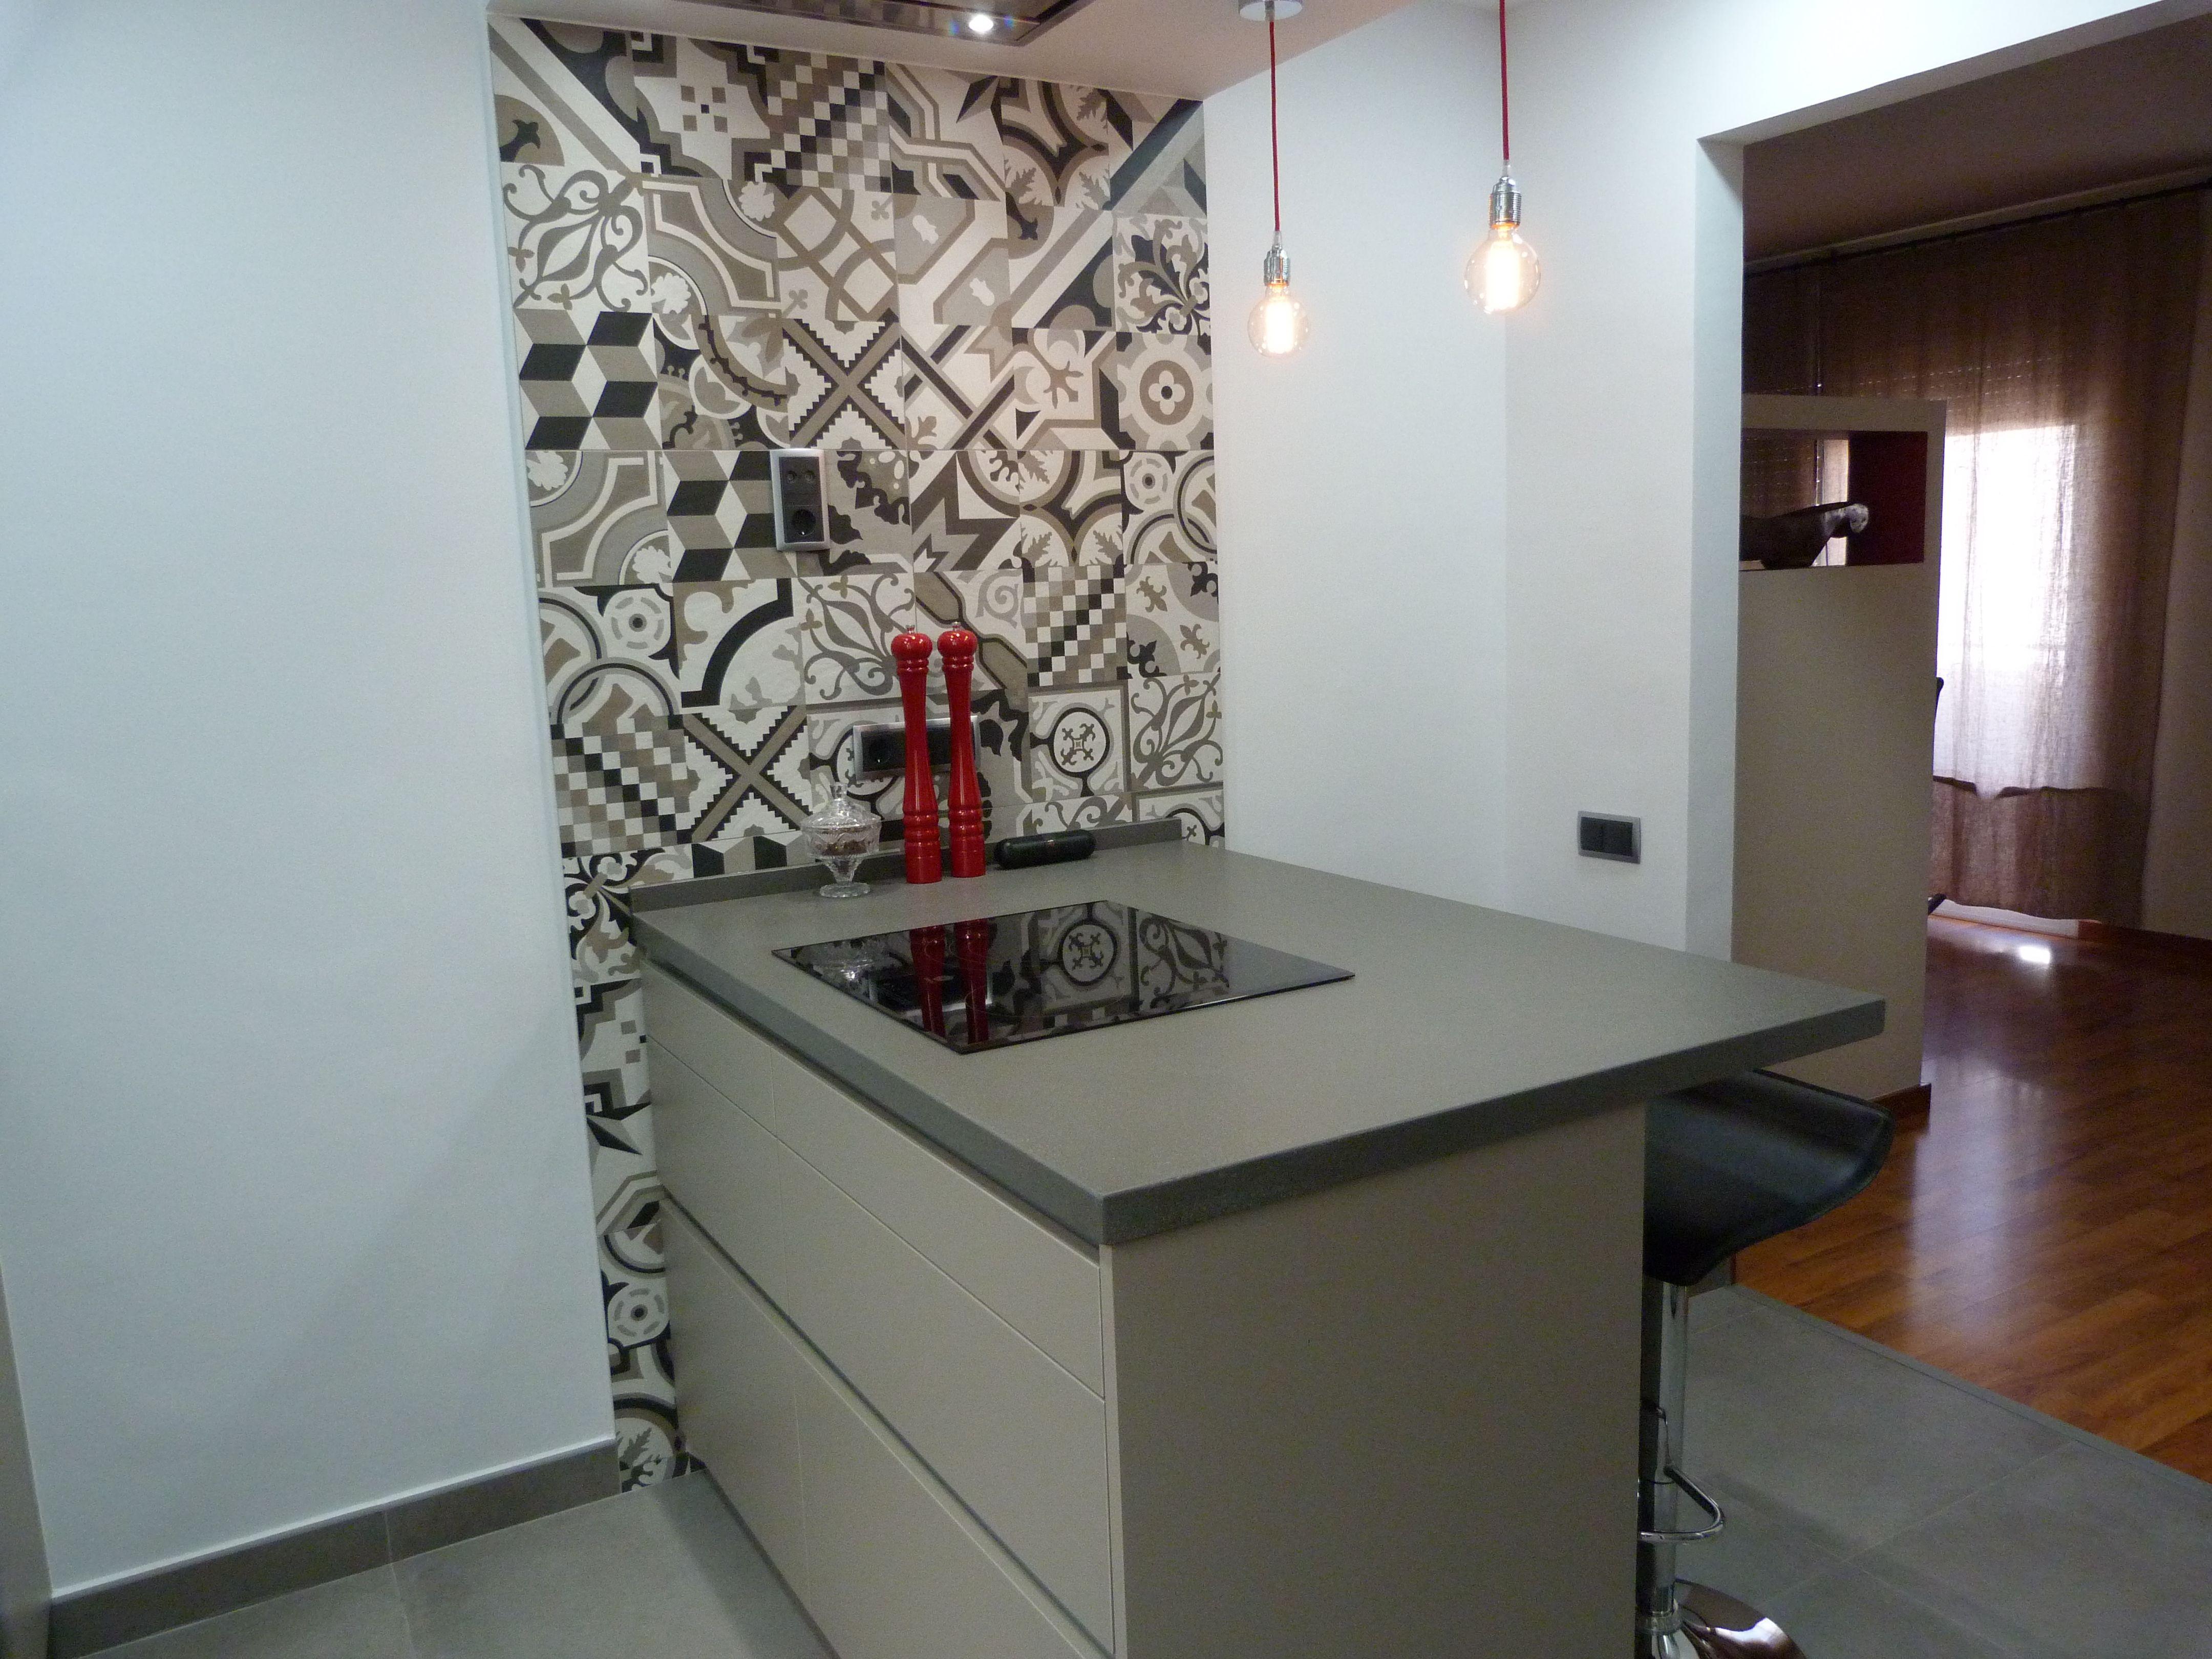 Reforma cocina con Mobiliario Santos modelo Line, gris arena ...